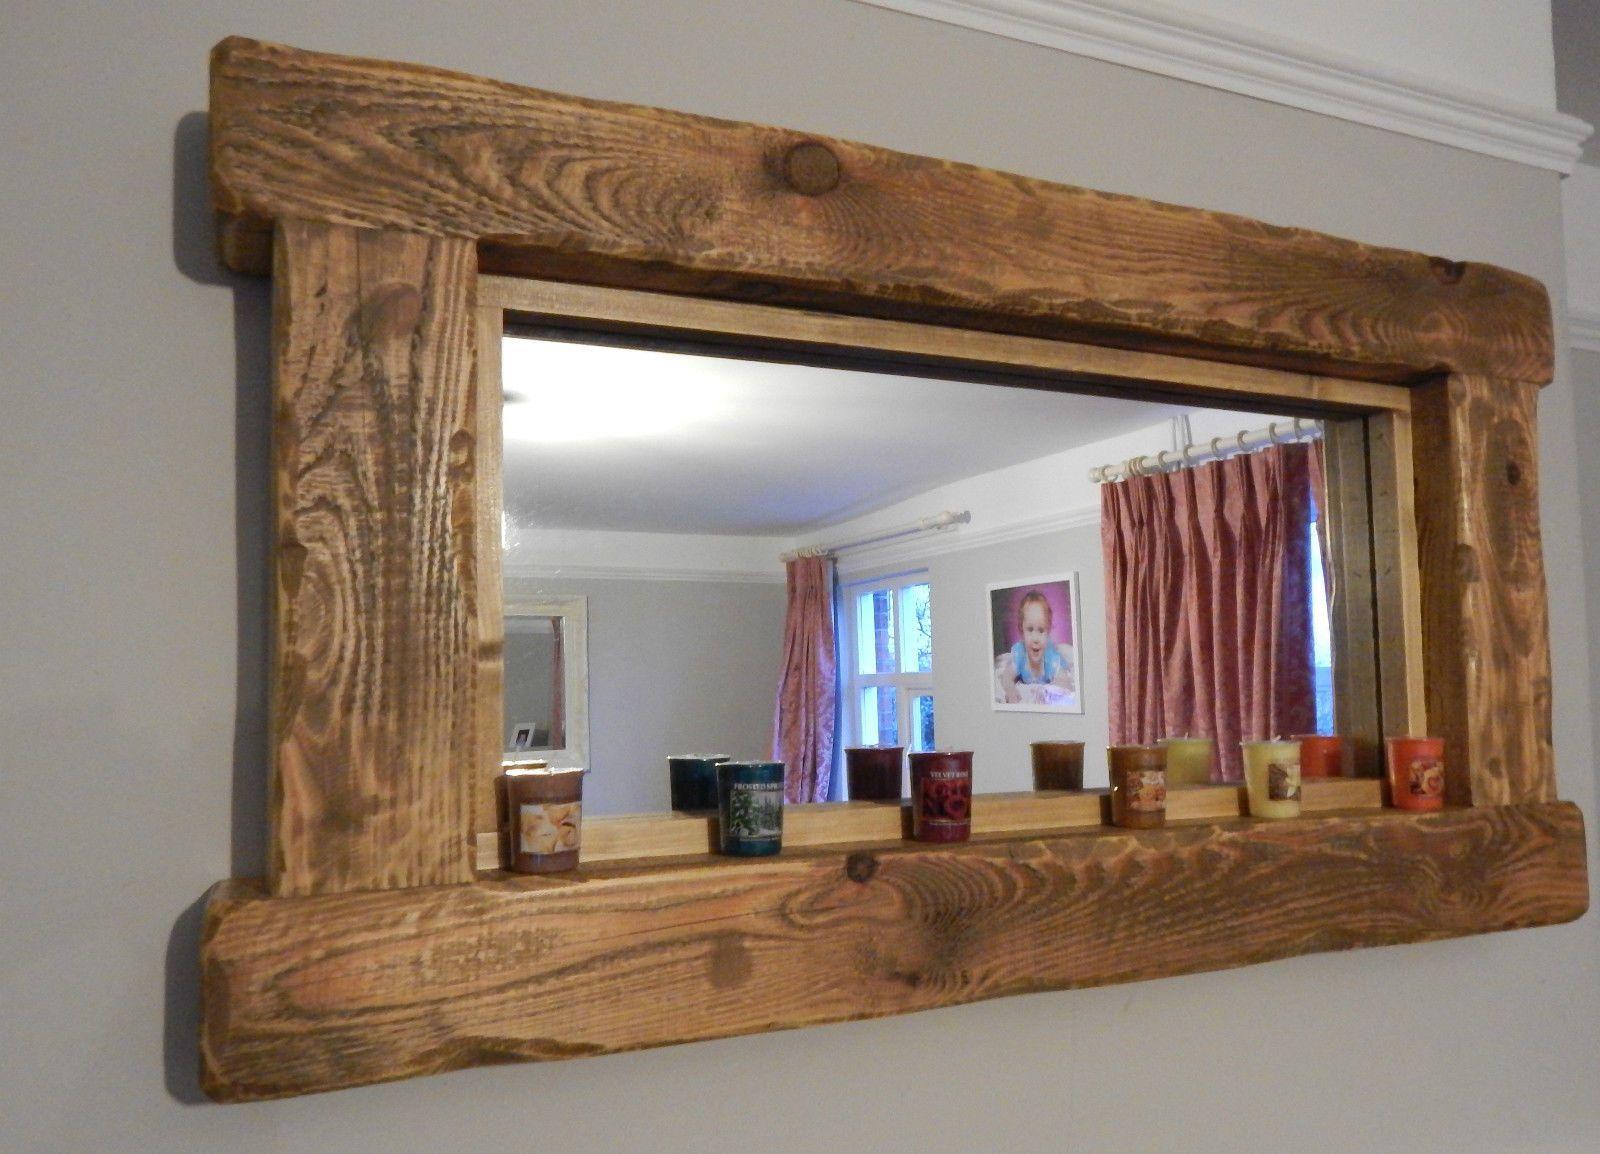 Chunky Rustic Reclaimed Wooden Mirror Tea Light Shelf Wall Furniture Storage In Home Furniture Diy Home De Espejos Rusticos Espejos De Pared Espejos Madera